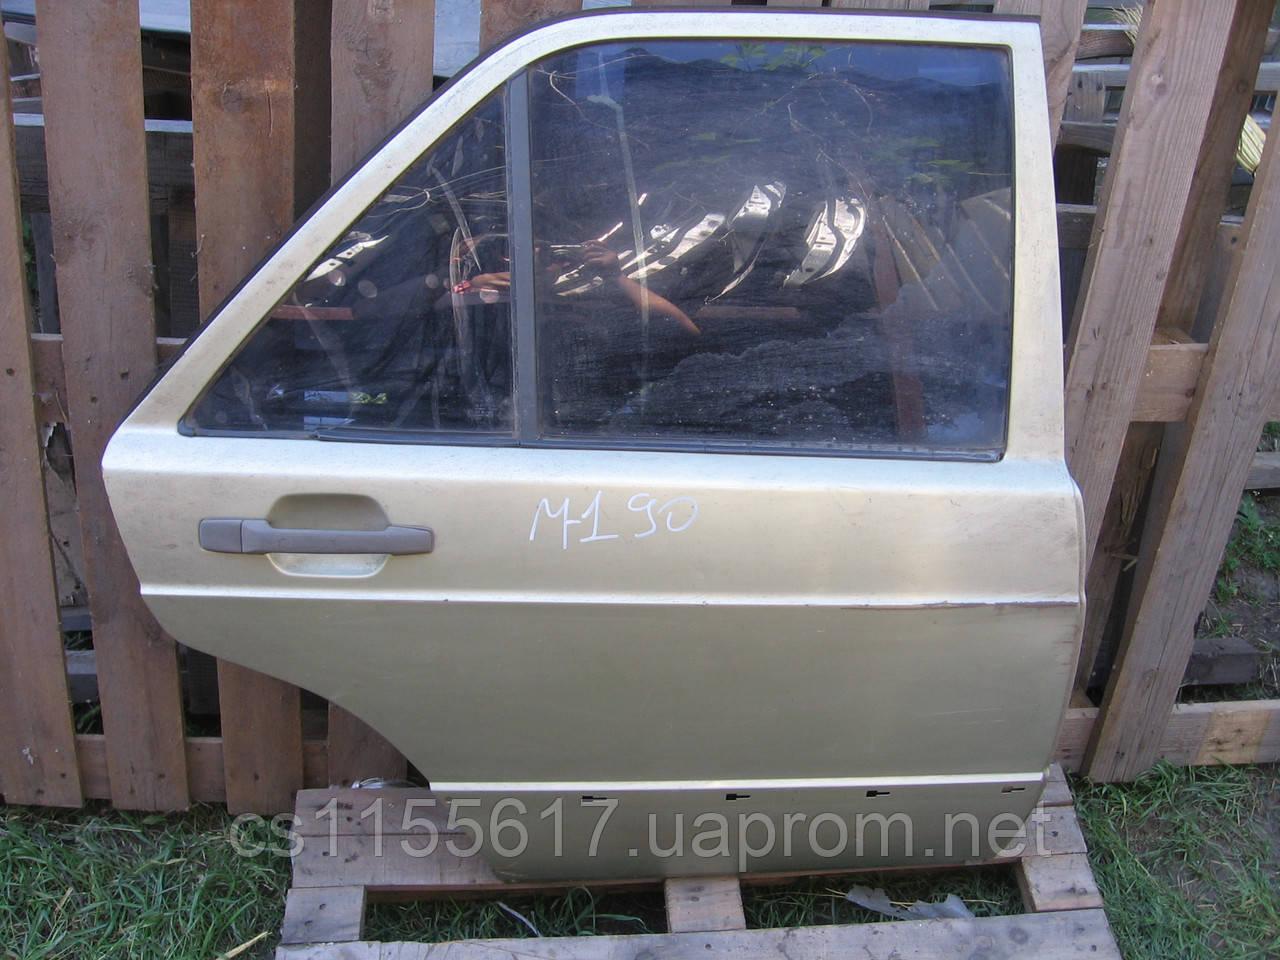 Дверь задняя правая б/у на Mercedes 190 (W201) год 1982-1993